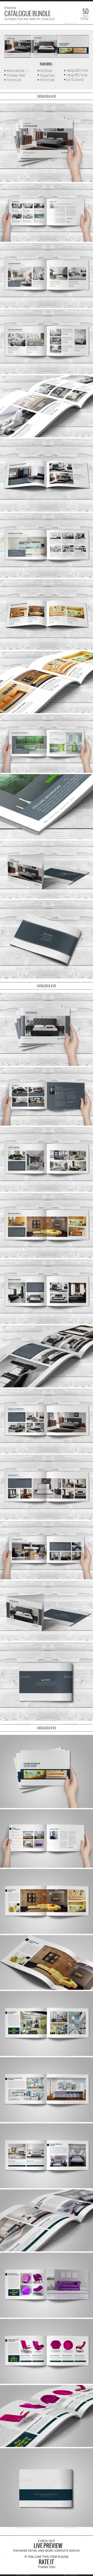 Interior Catalog Bundle Vol. 01 - Catalogs Brochures